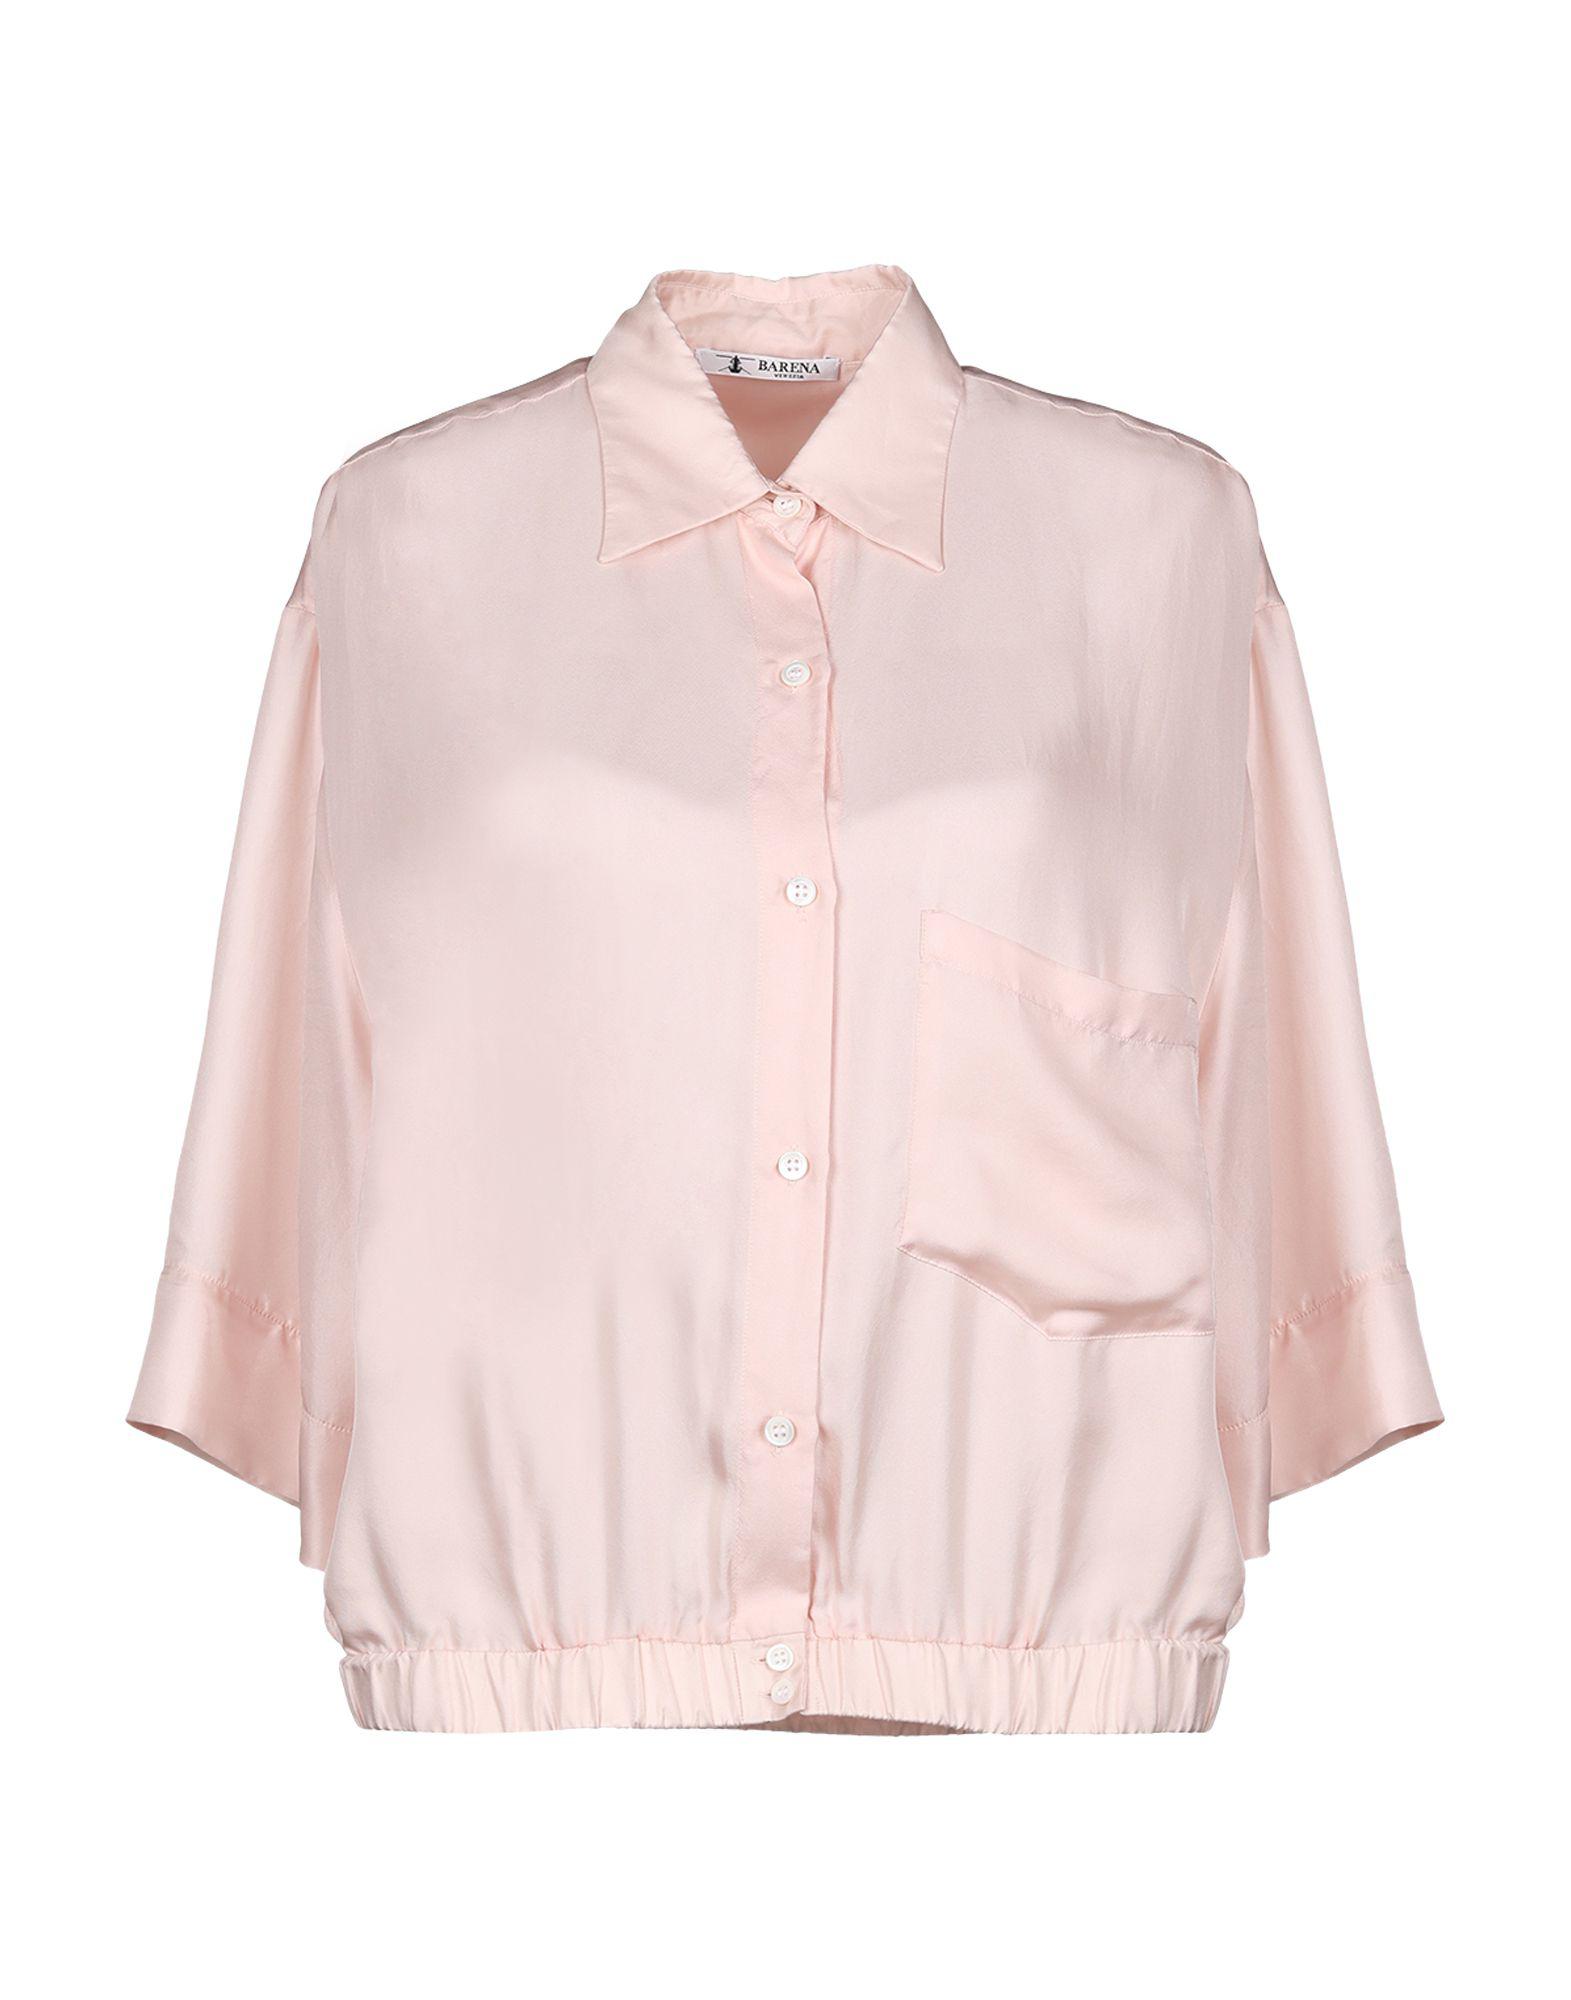 Barena Venezia Silk Shirts & Blouses In Light Pink